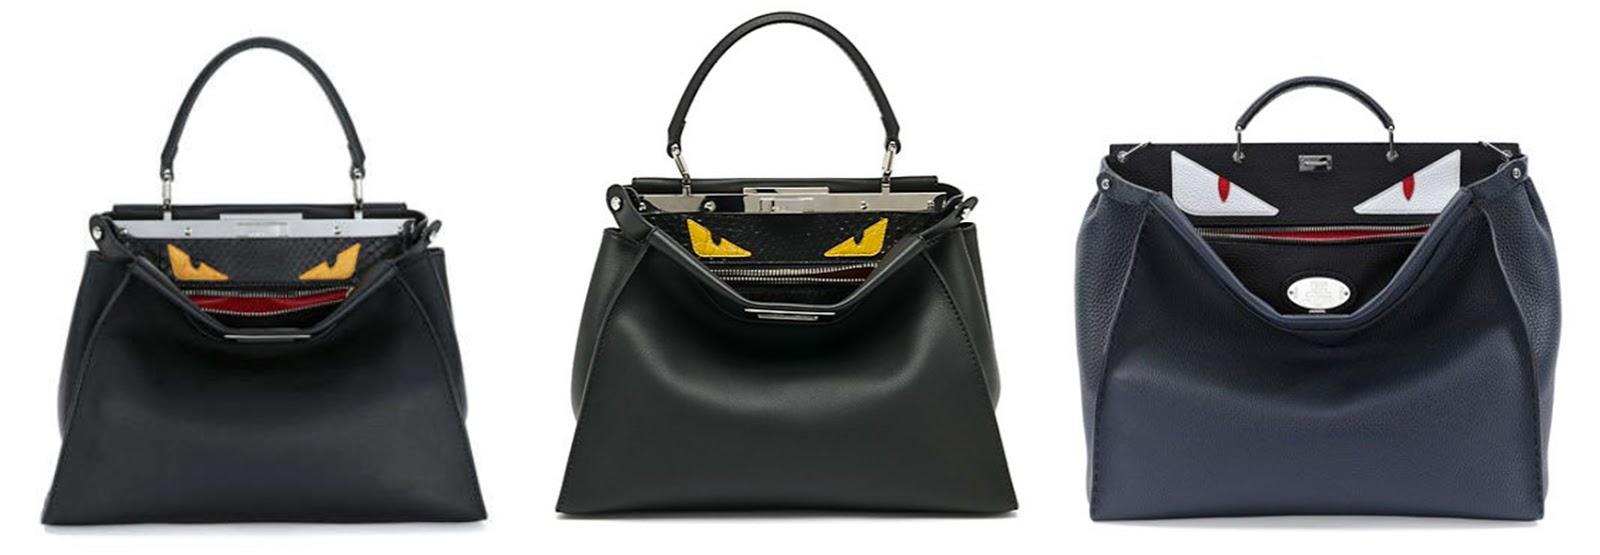 d578cf38a7b1 Would You Carry That Bag  Fendi Peekaboo Bag